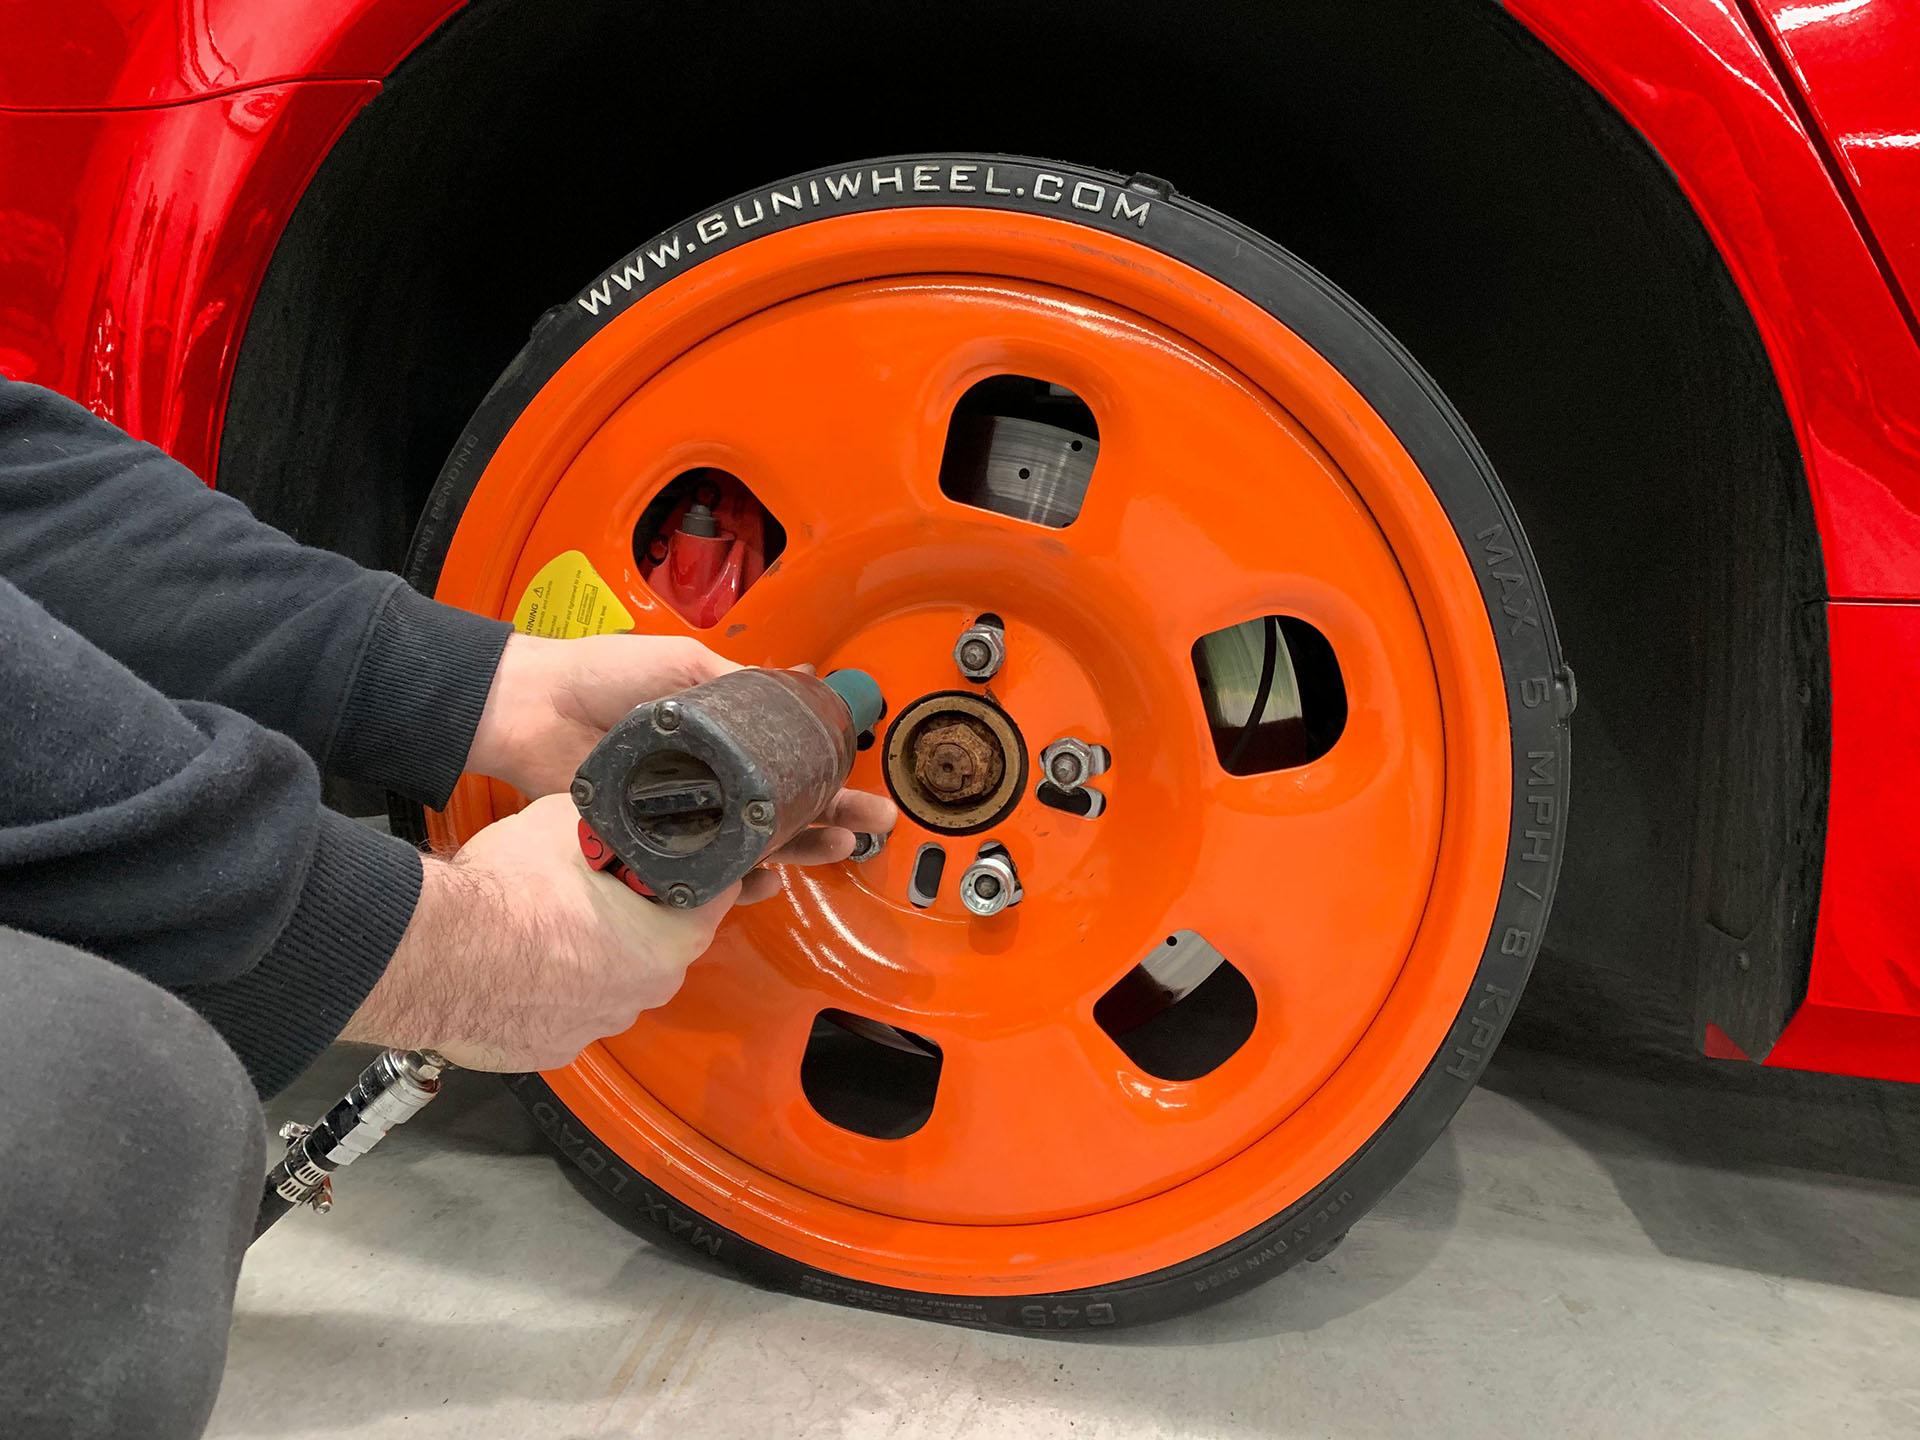 technician installing Guniwheel